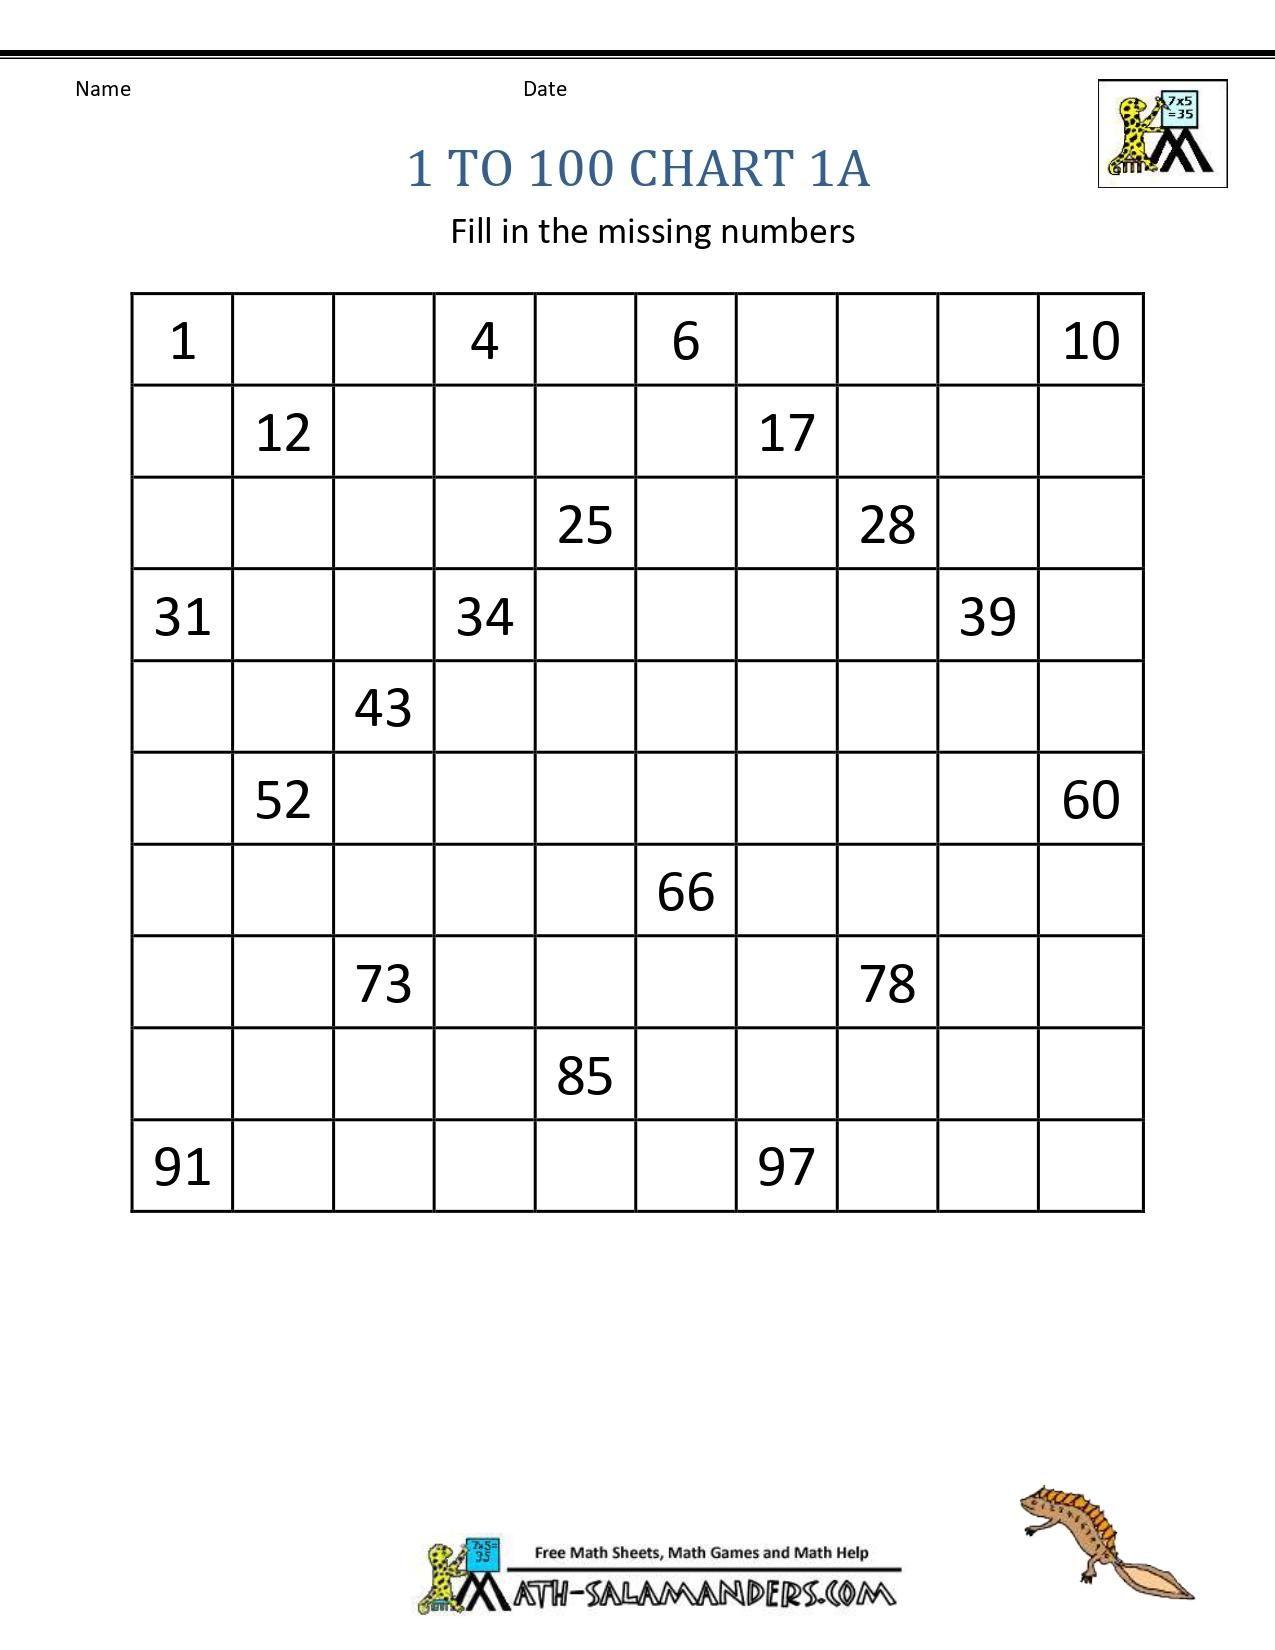 10 Grade 1 Math Geometry Worksheets In